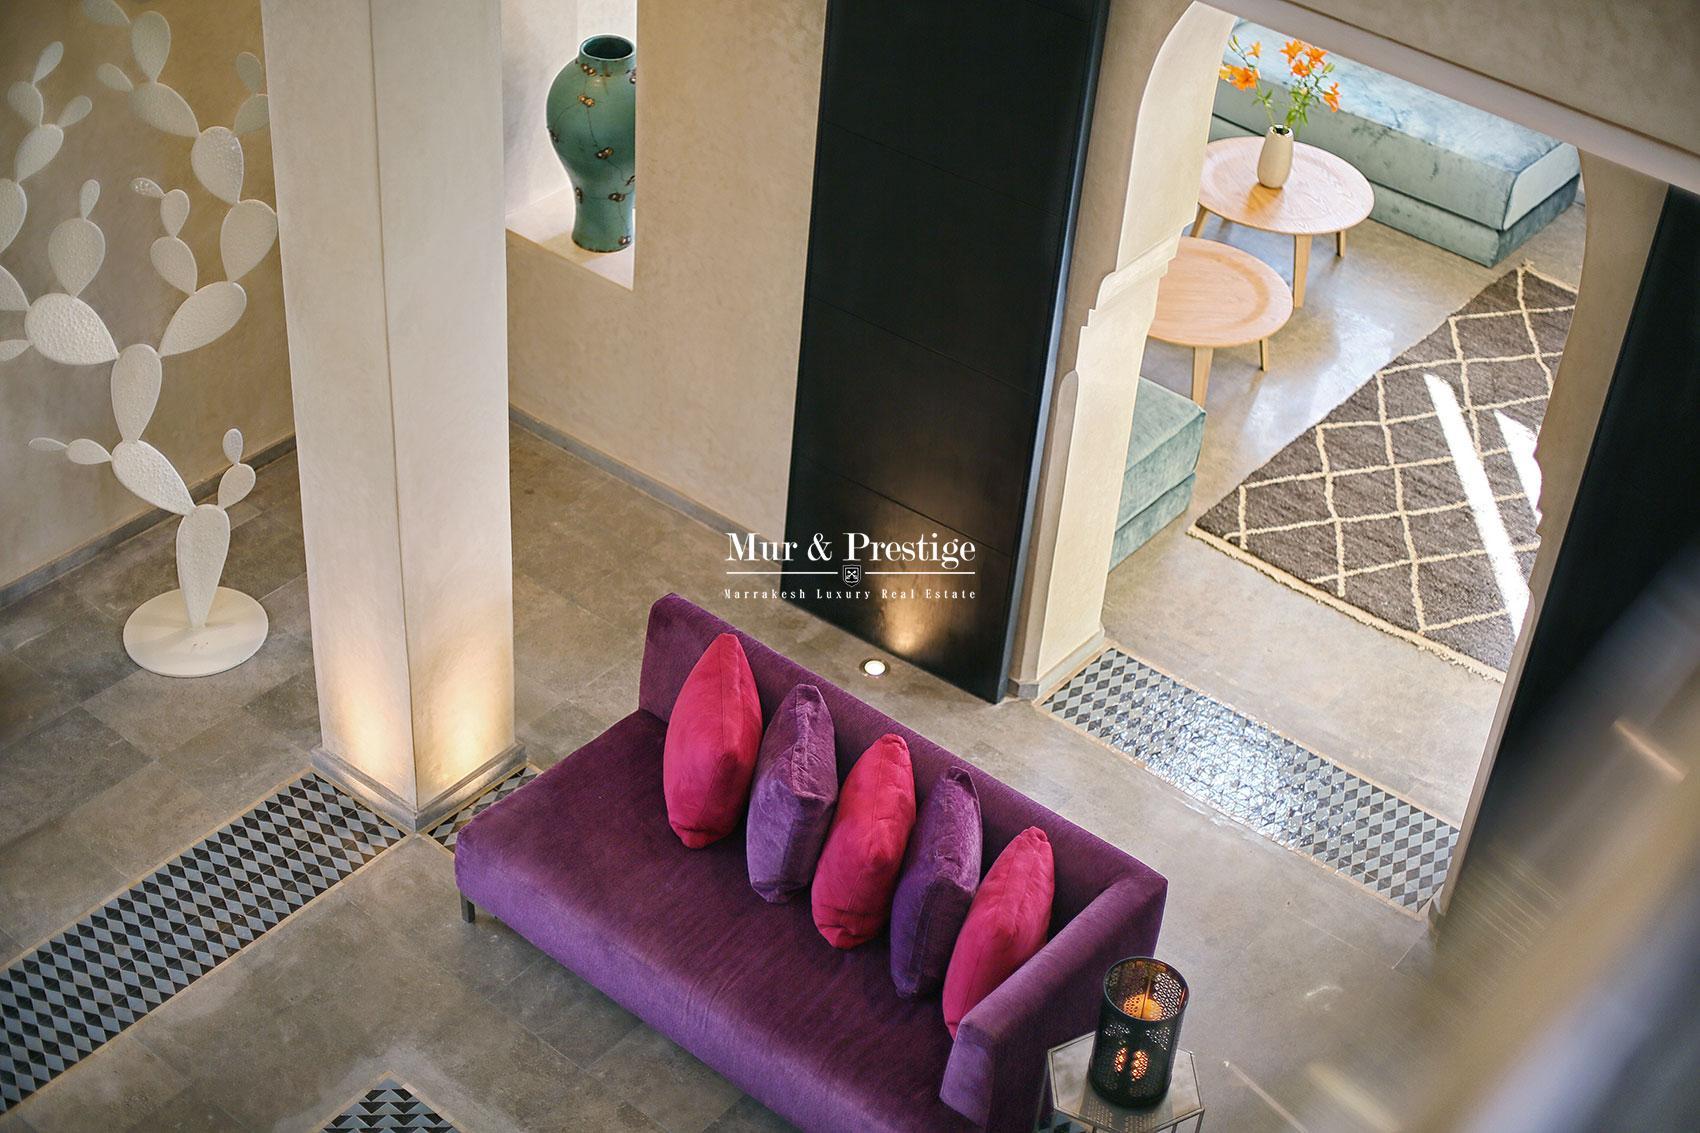 Vente d'une villa de prestige a Marrakech